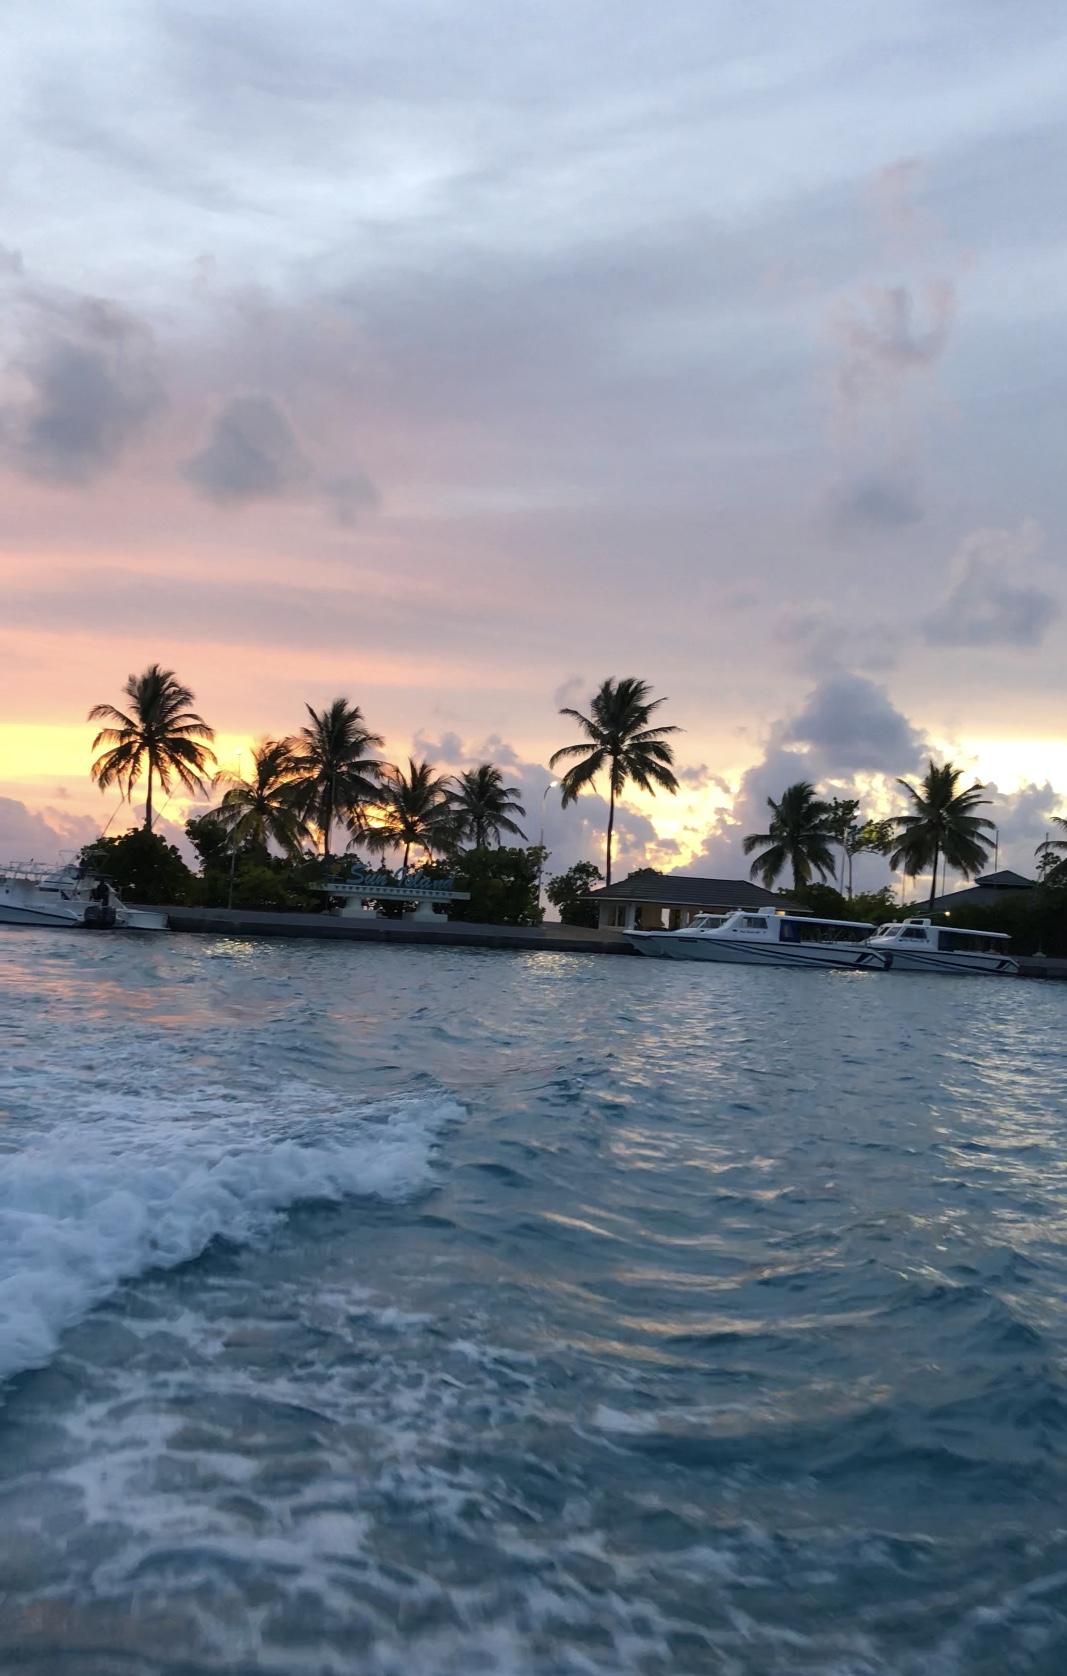 Maldives, Sun island resort and spa